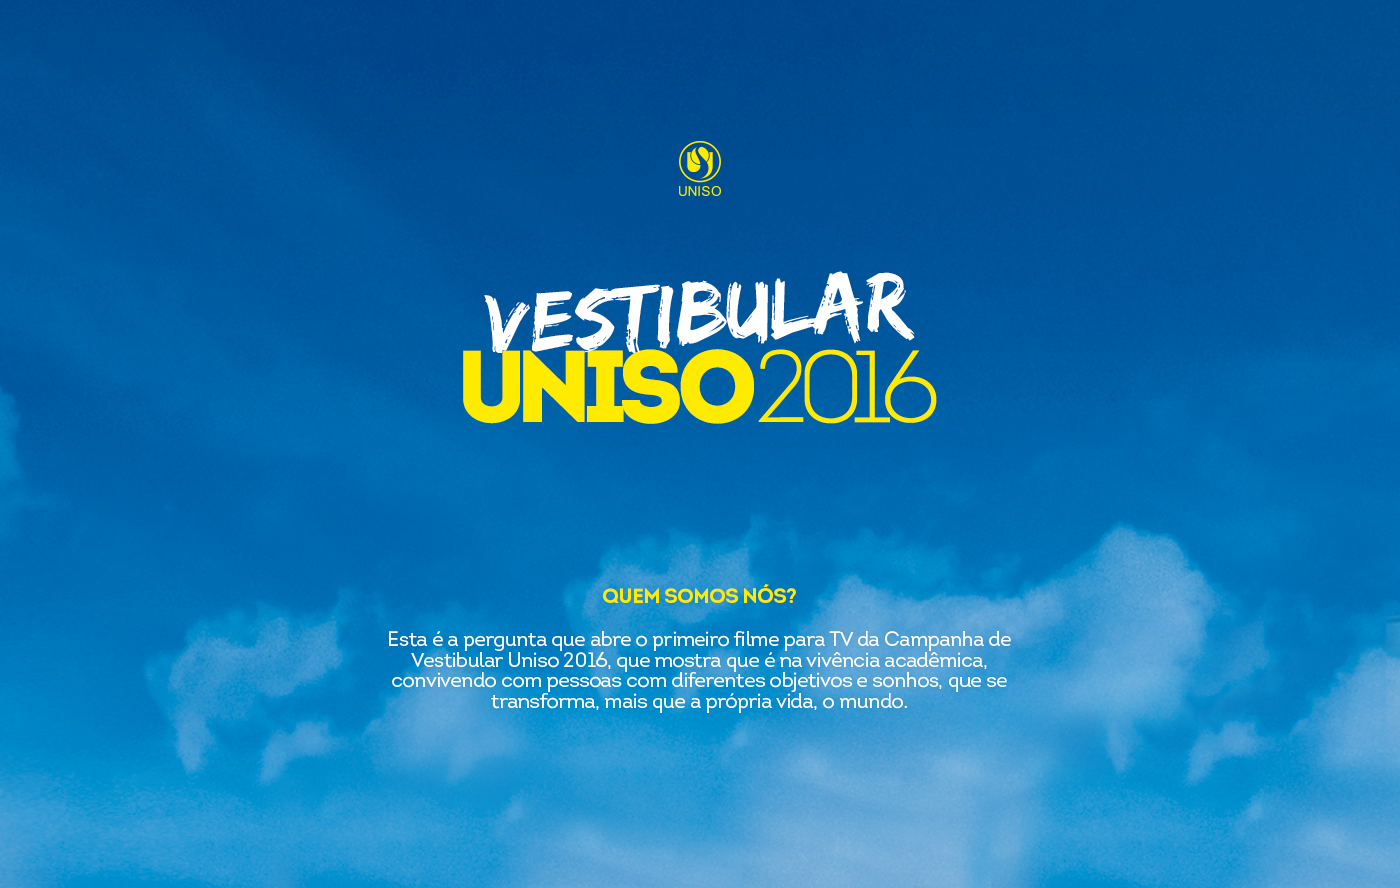 uniso vestibular escola universidade Vestibular 2016 University campaing enroll campanha design ads adverseting school colors college